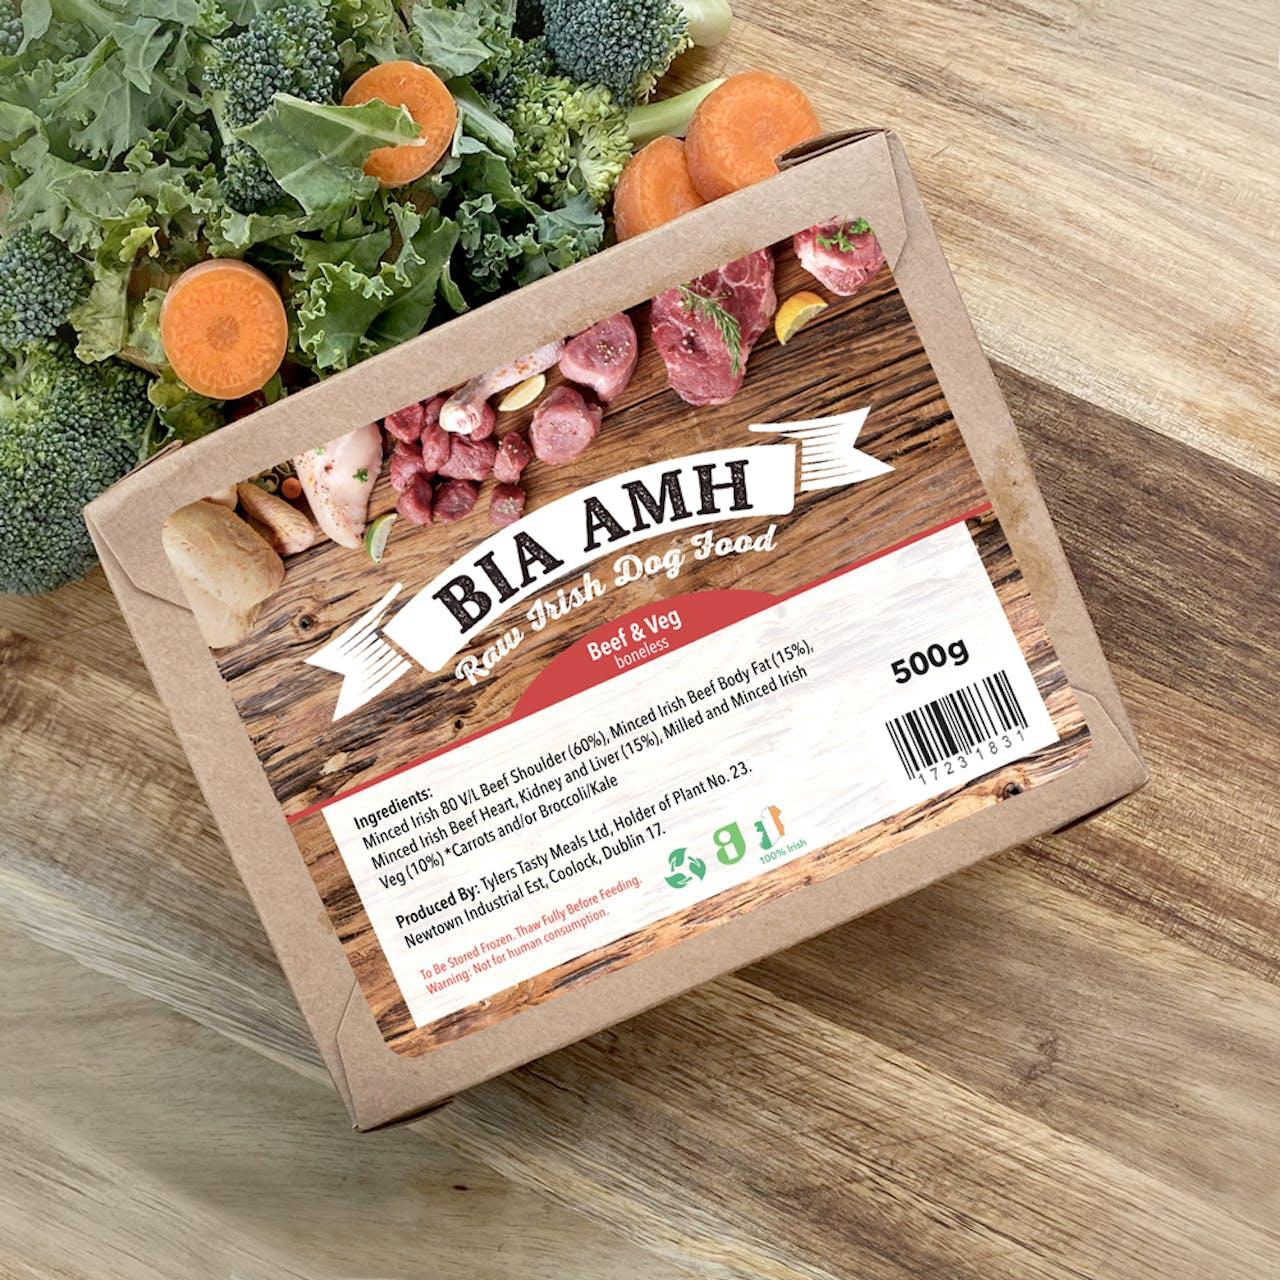 BIA AMH - BEEF & VEG